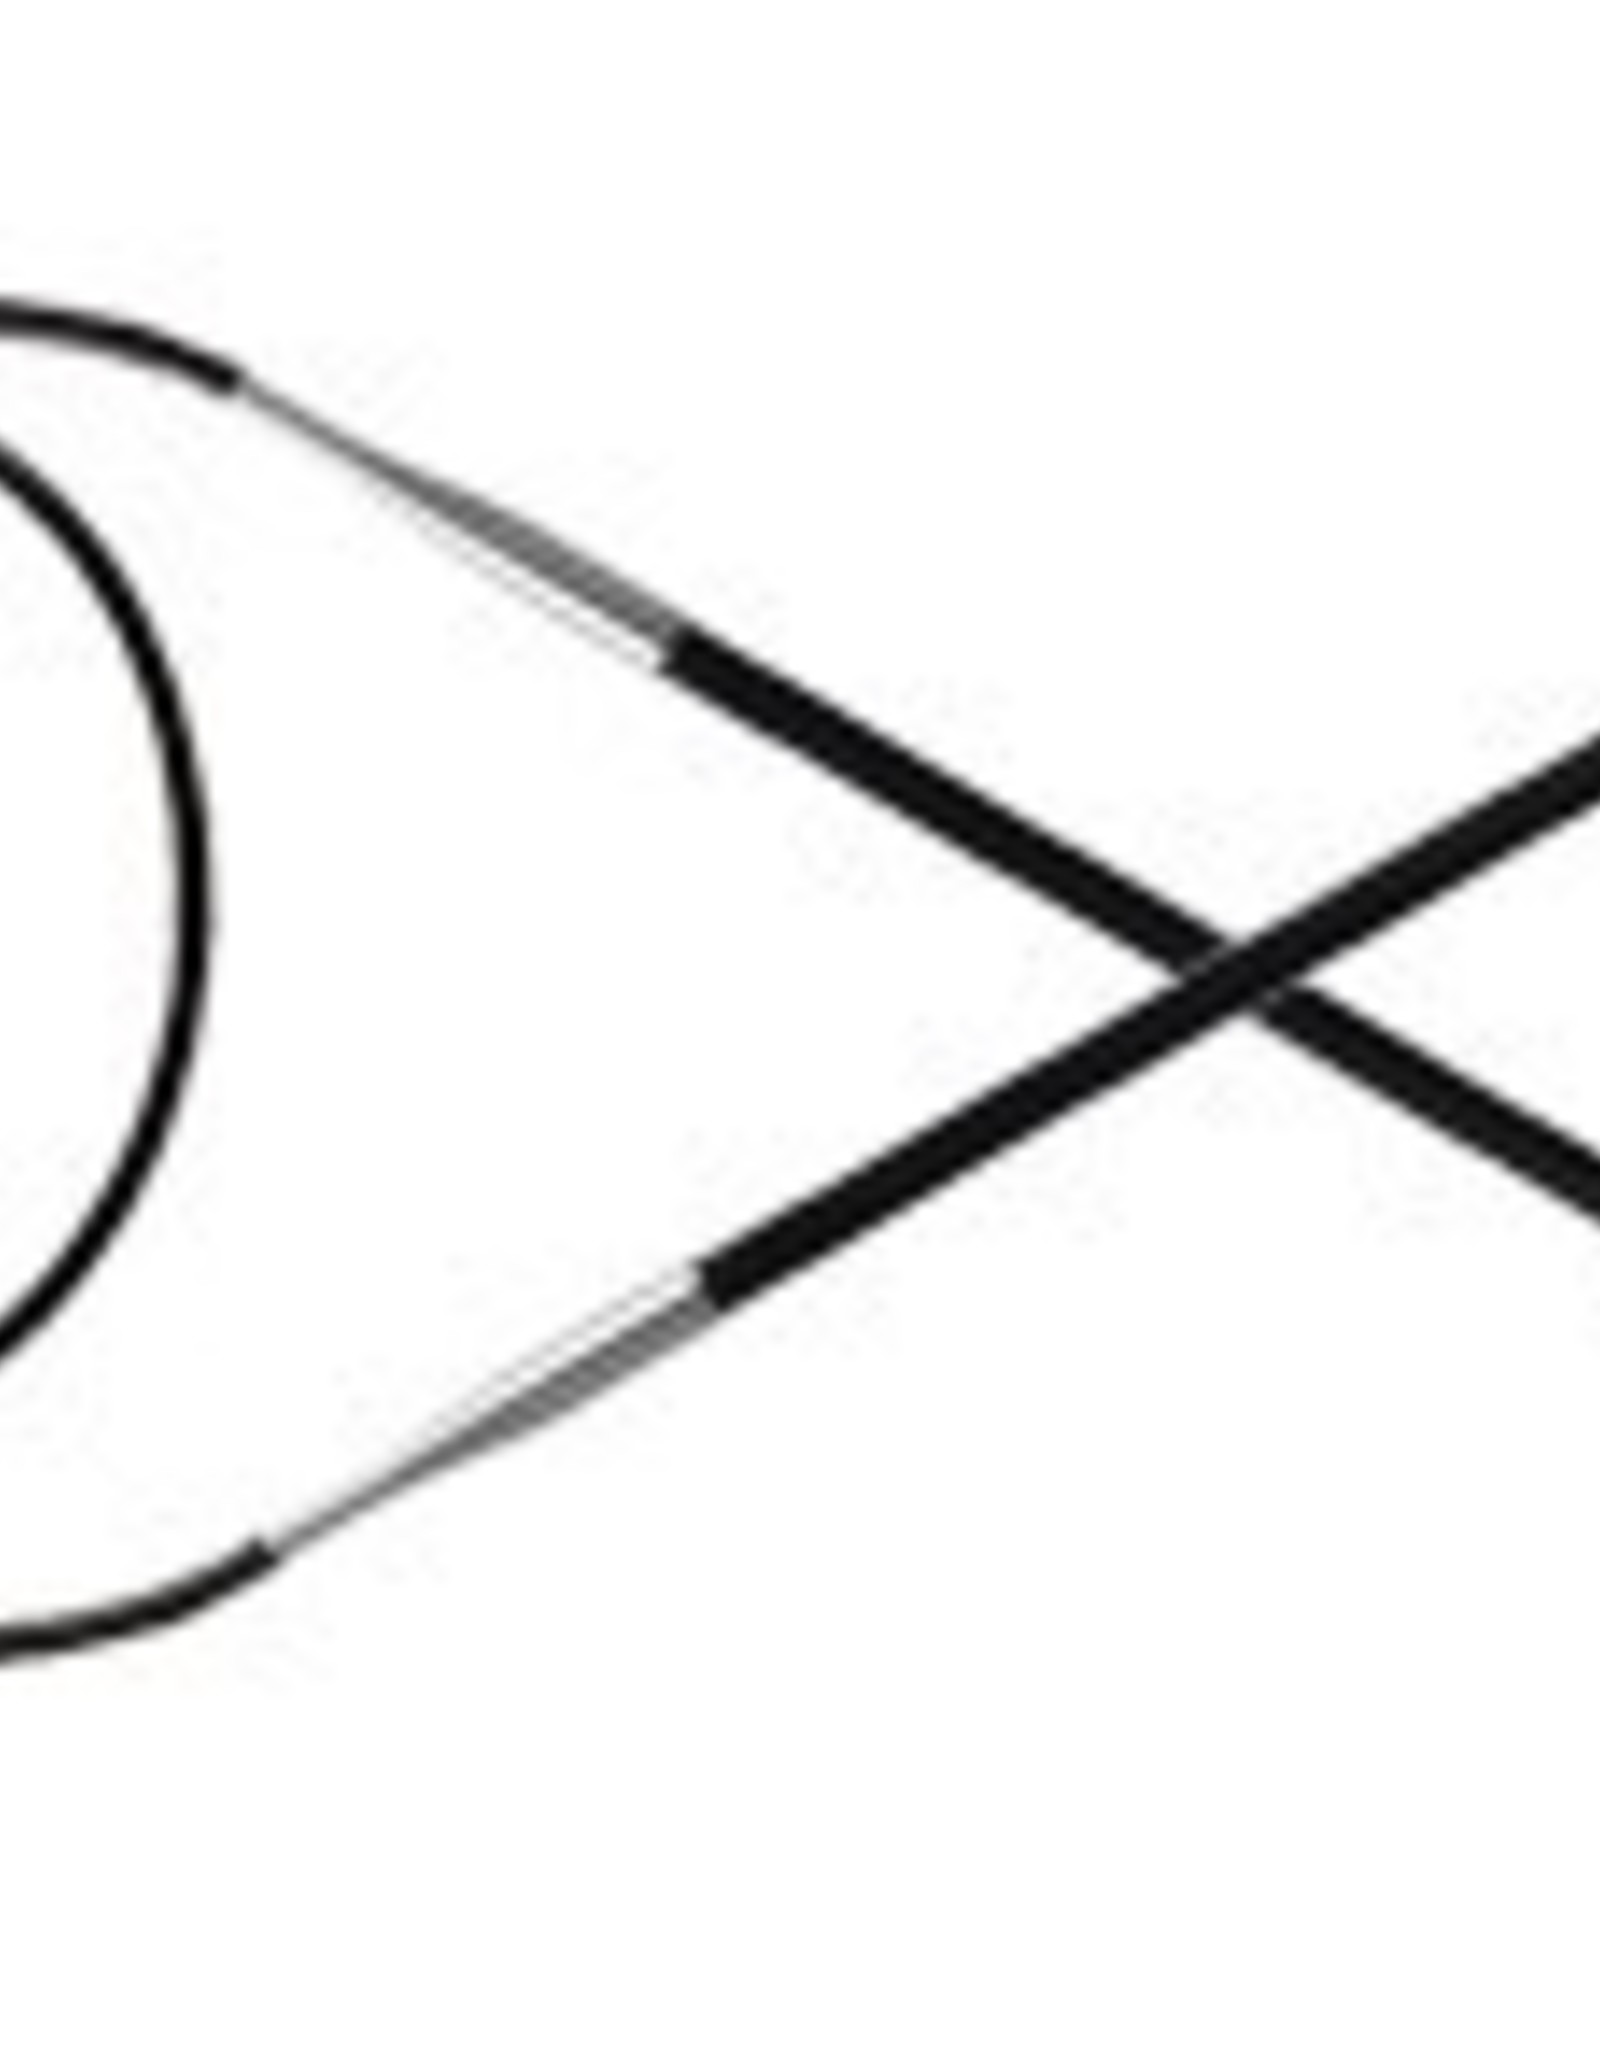 Knitter's Pride 10.5 Karbonz Circular 32